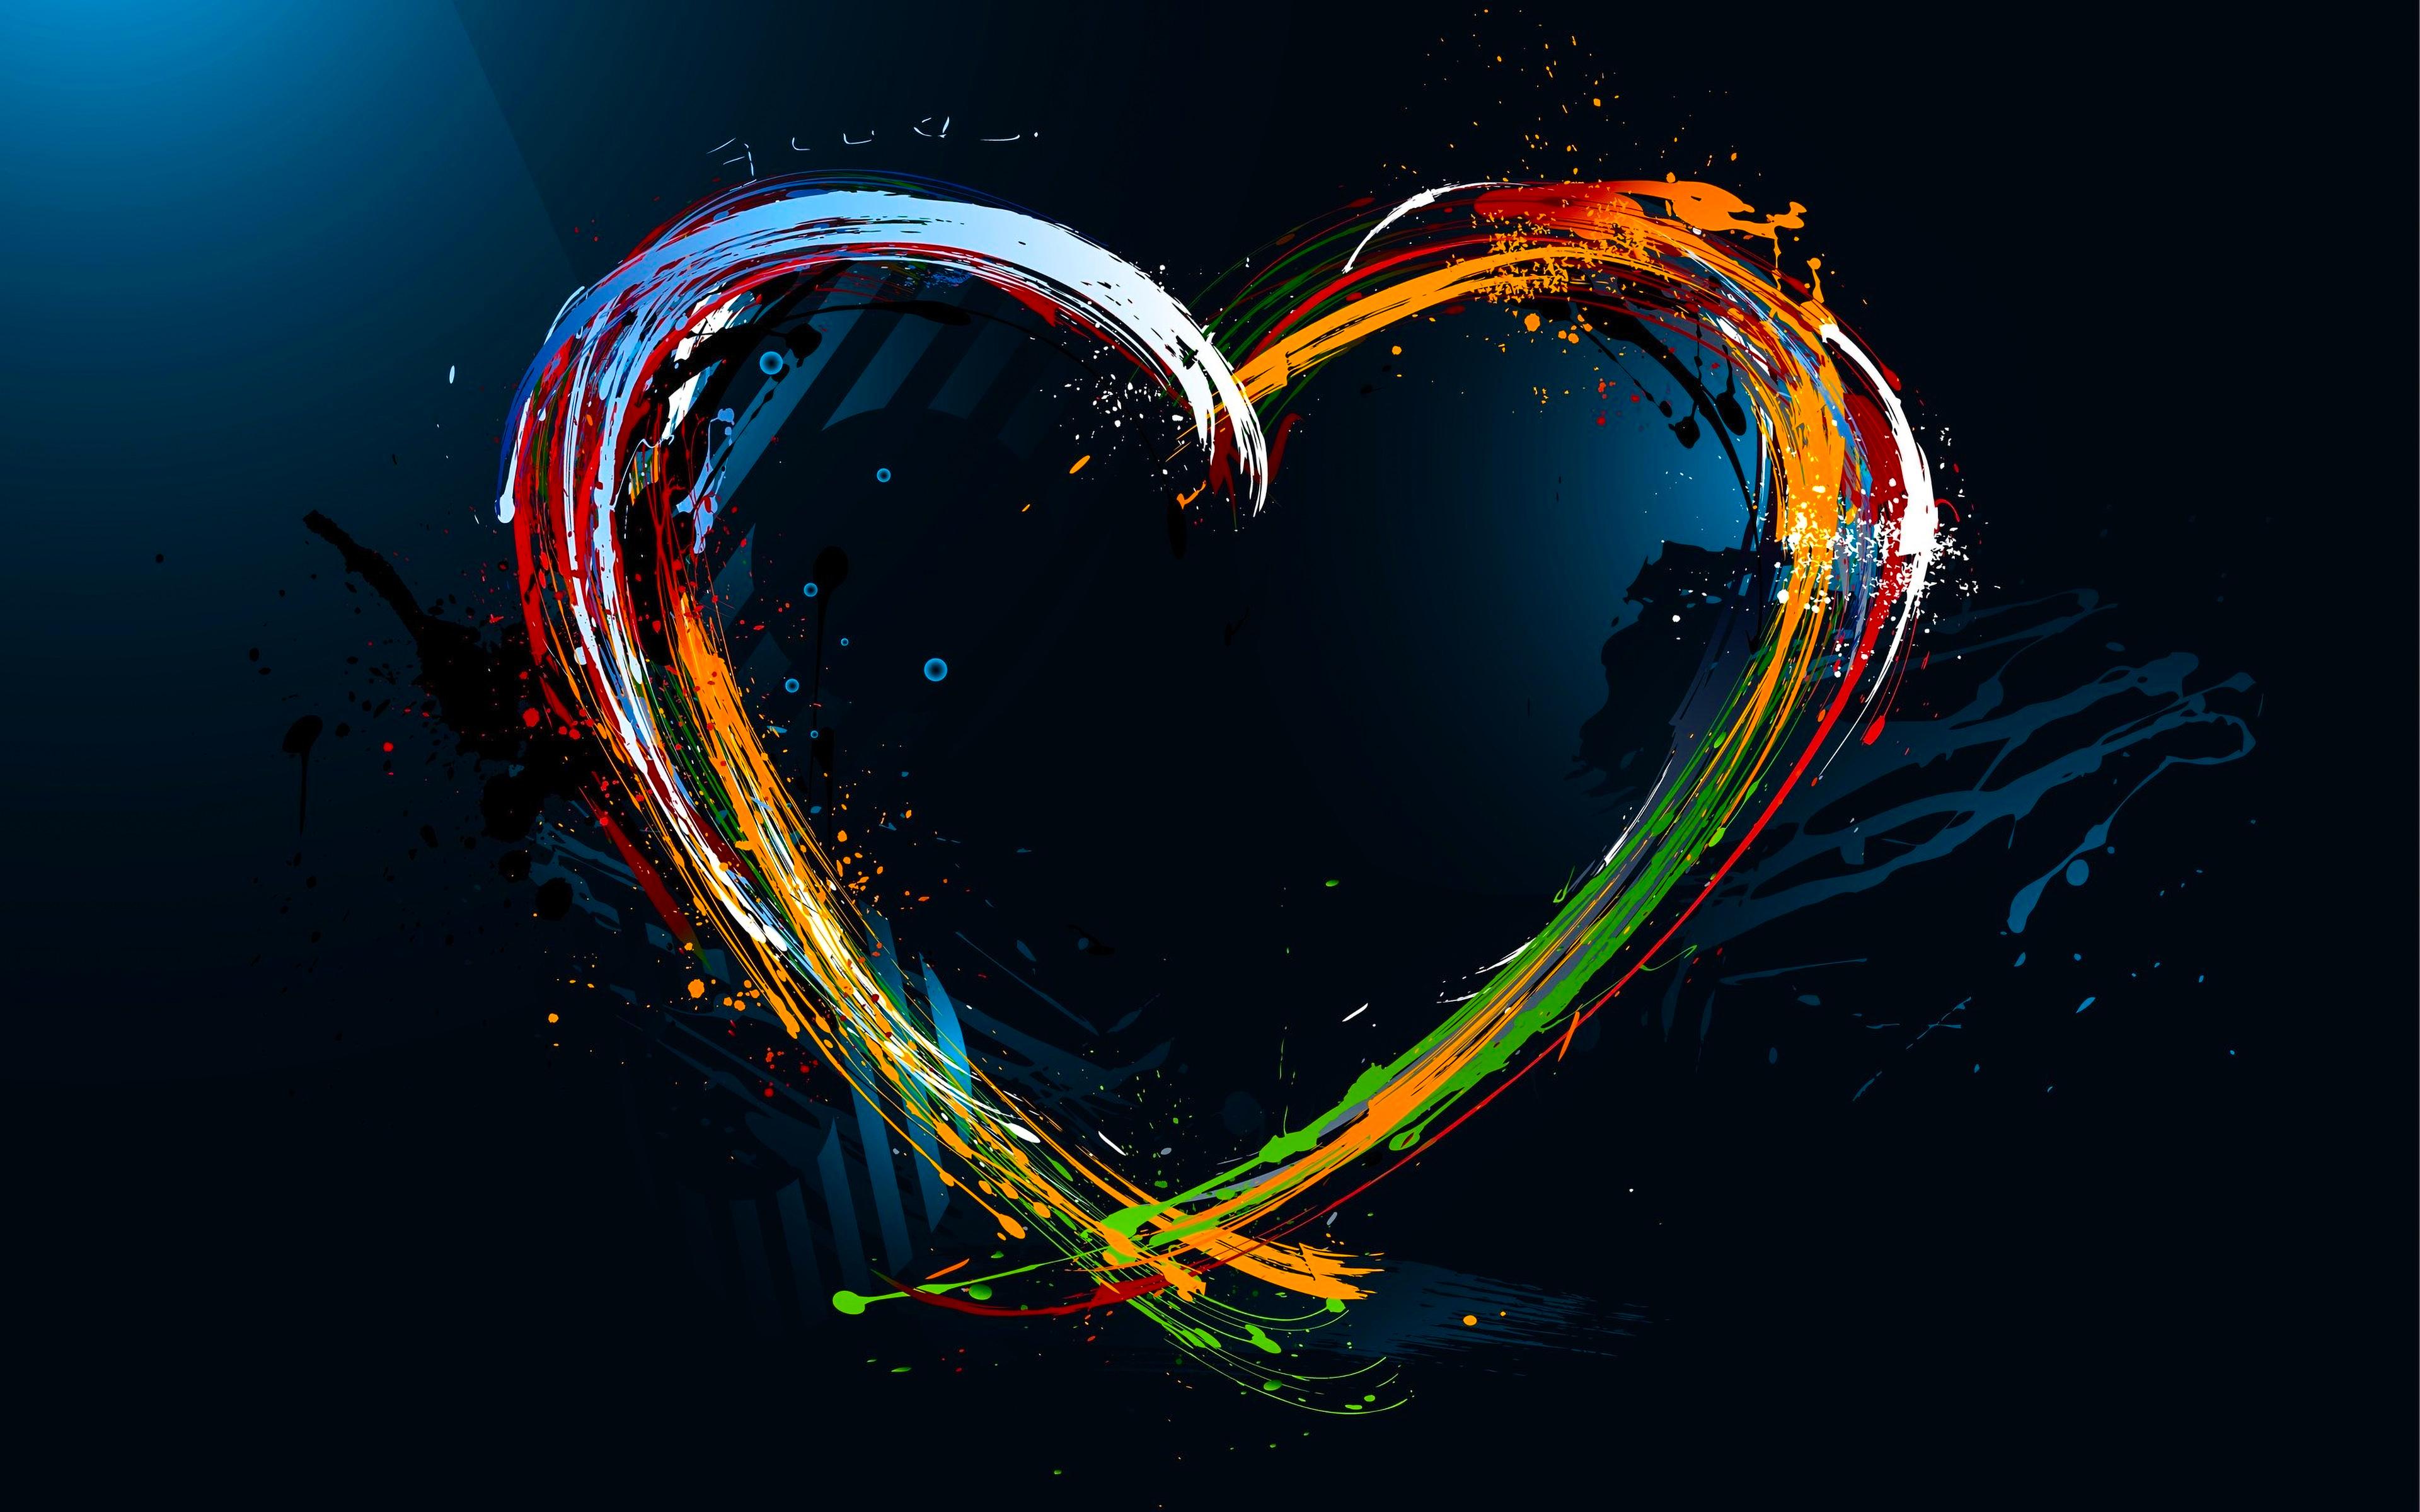 Картинка: Сердце, краски, тёмный фон